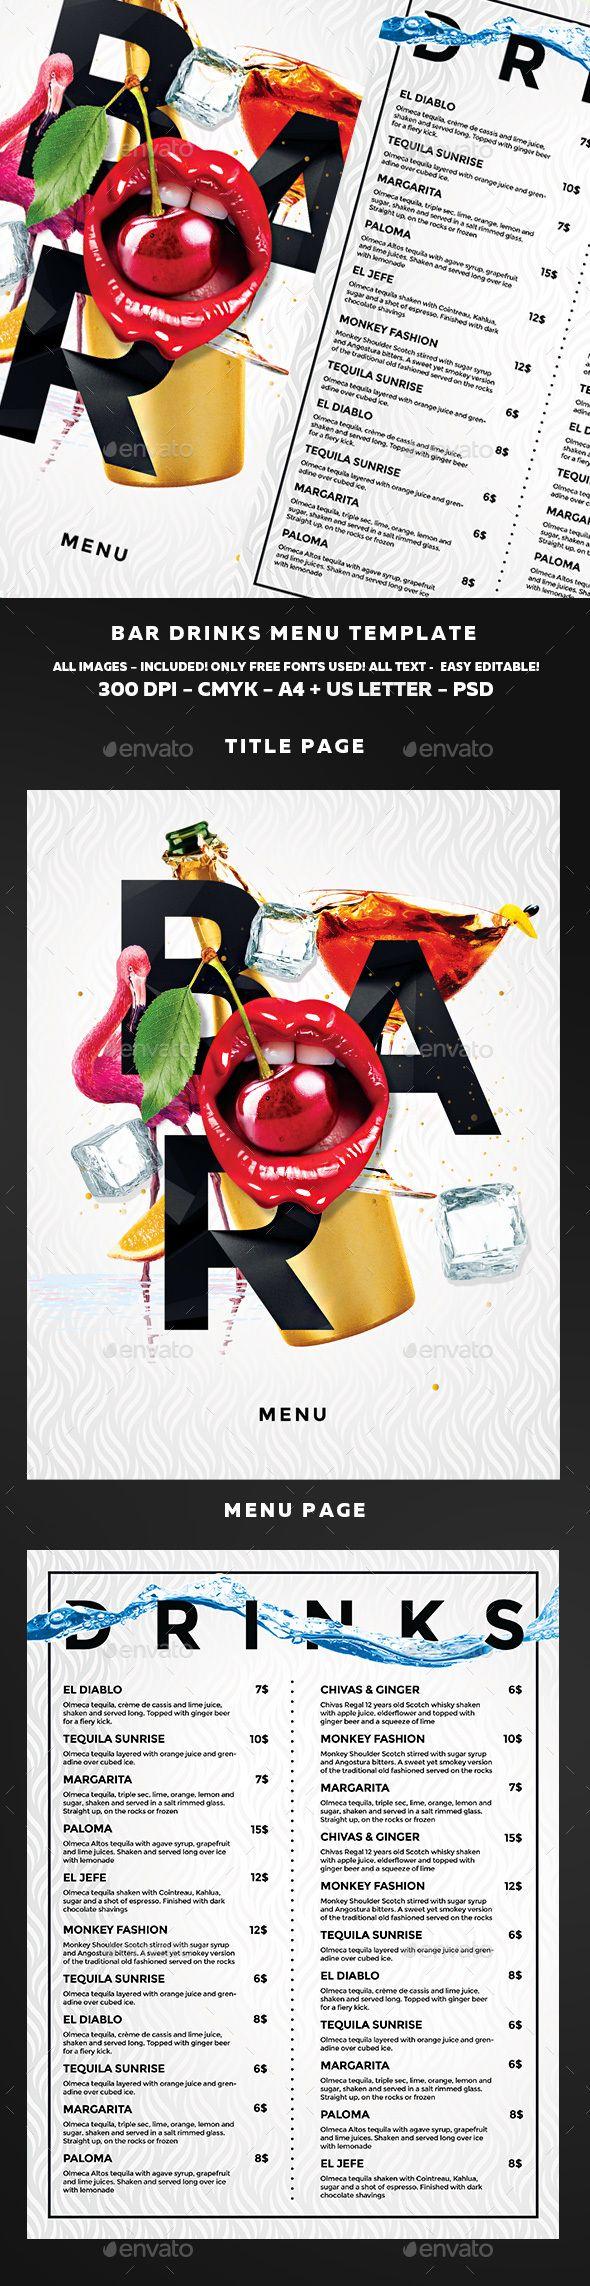 Cocktail Menu | Pinterest